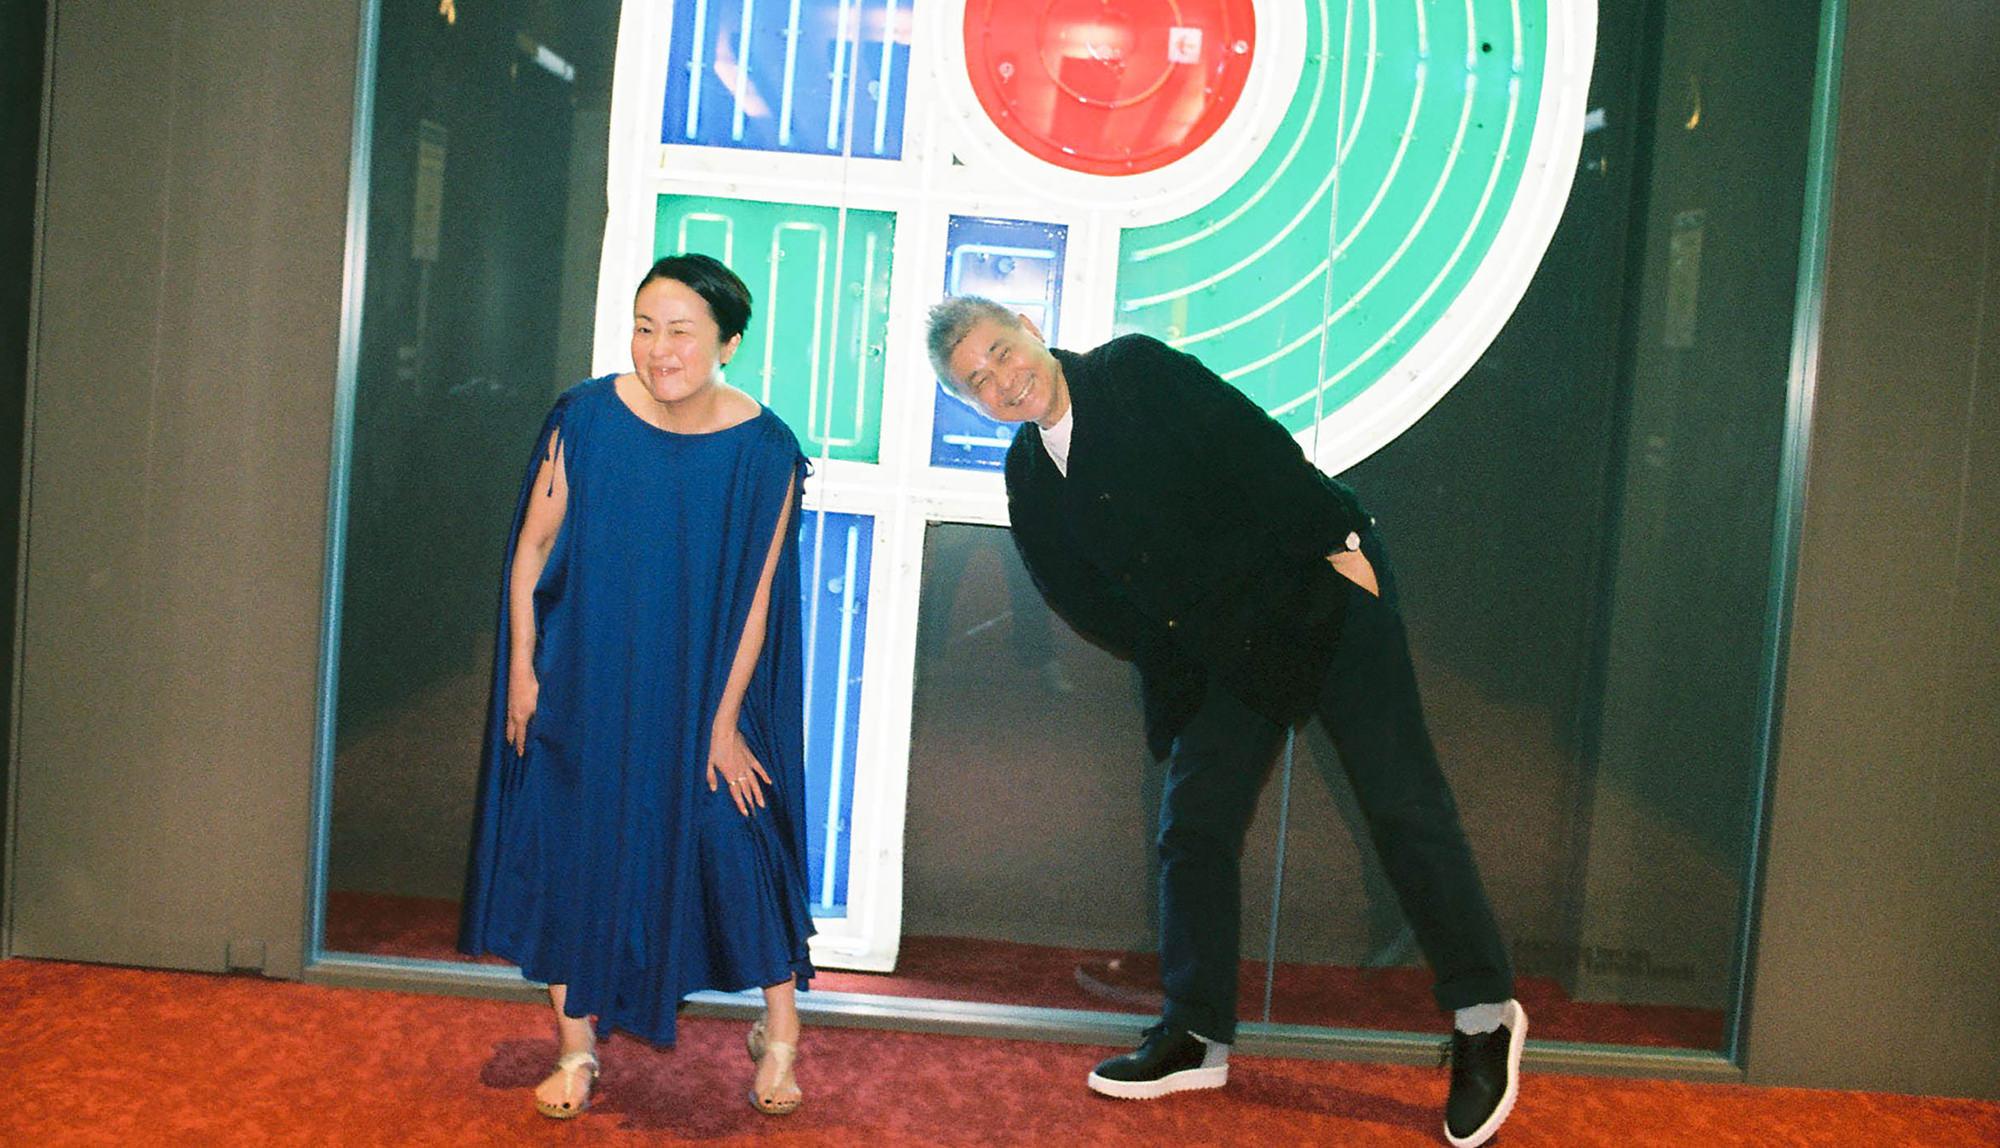 Interview 伊藤まさこ(スタイリスト)×糸井重里(ほぼ日代表) ほぼ日曜日「まさこ百景」